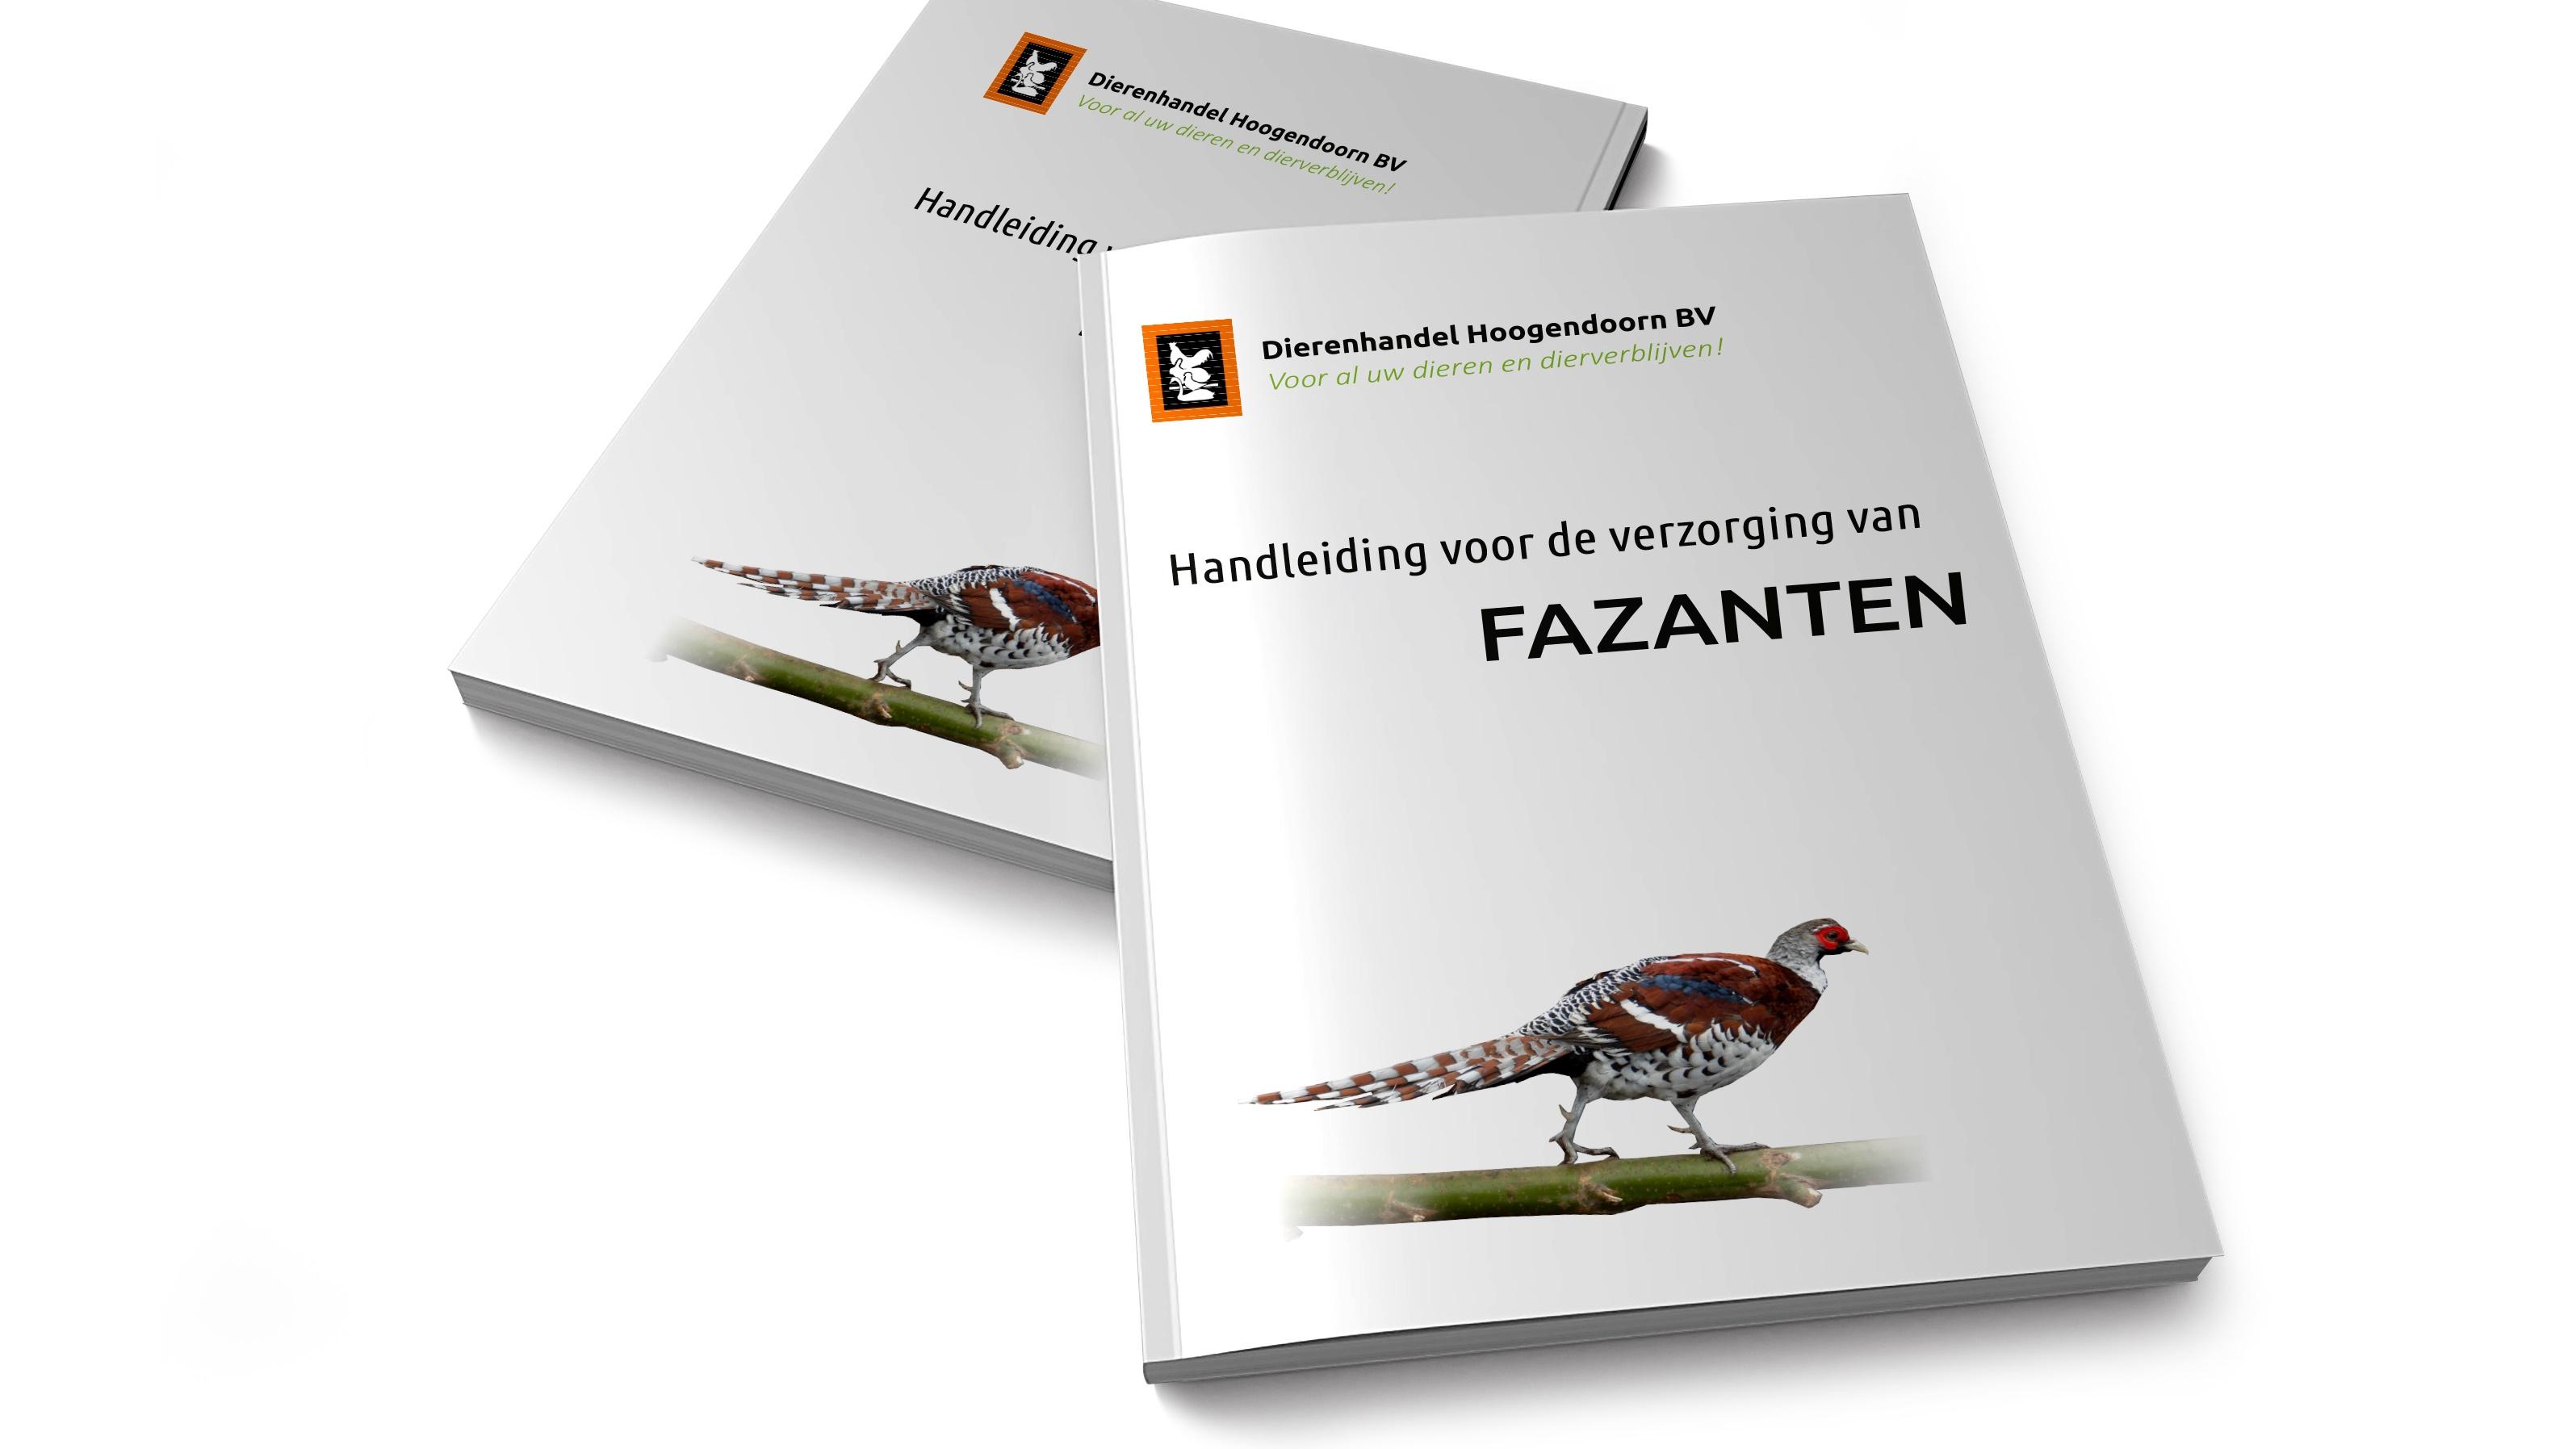 Handleiding fazant